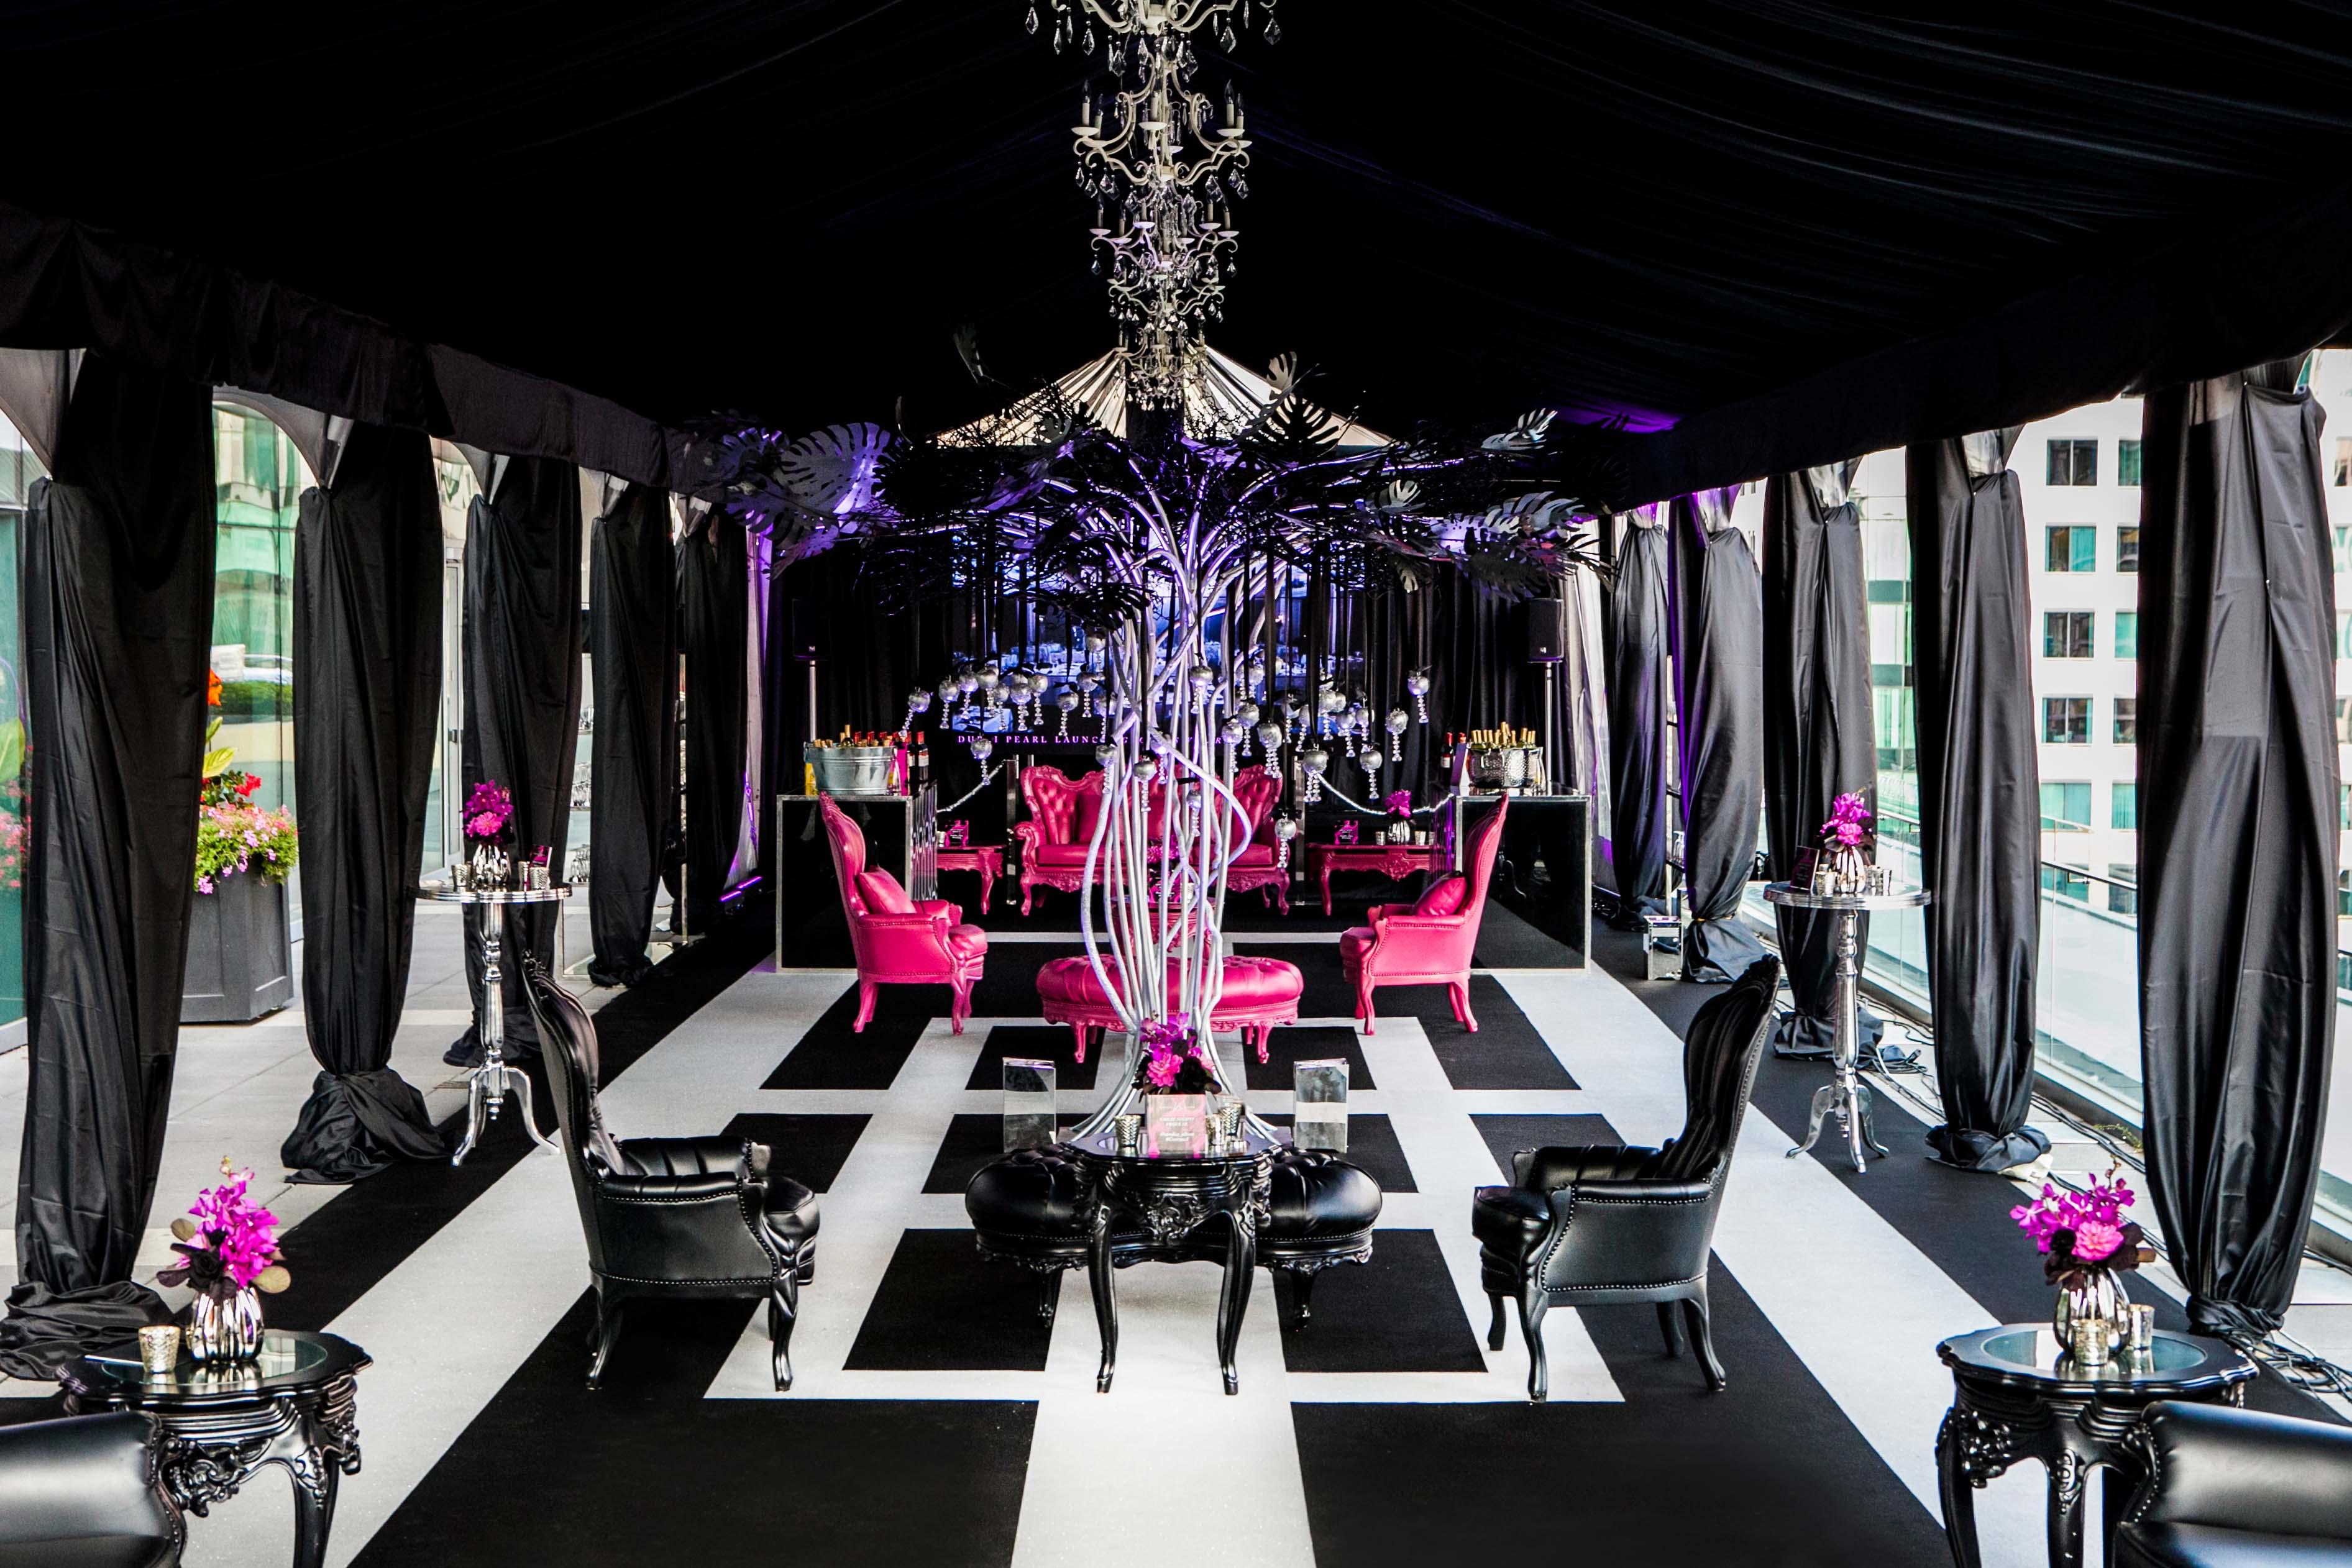 A custom tent floor design featuring Glitter Slate carpet inset into Black Event Carpet